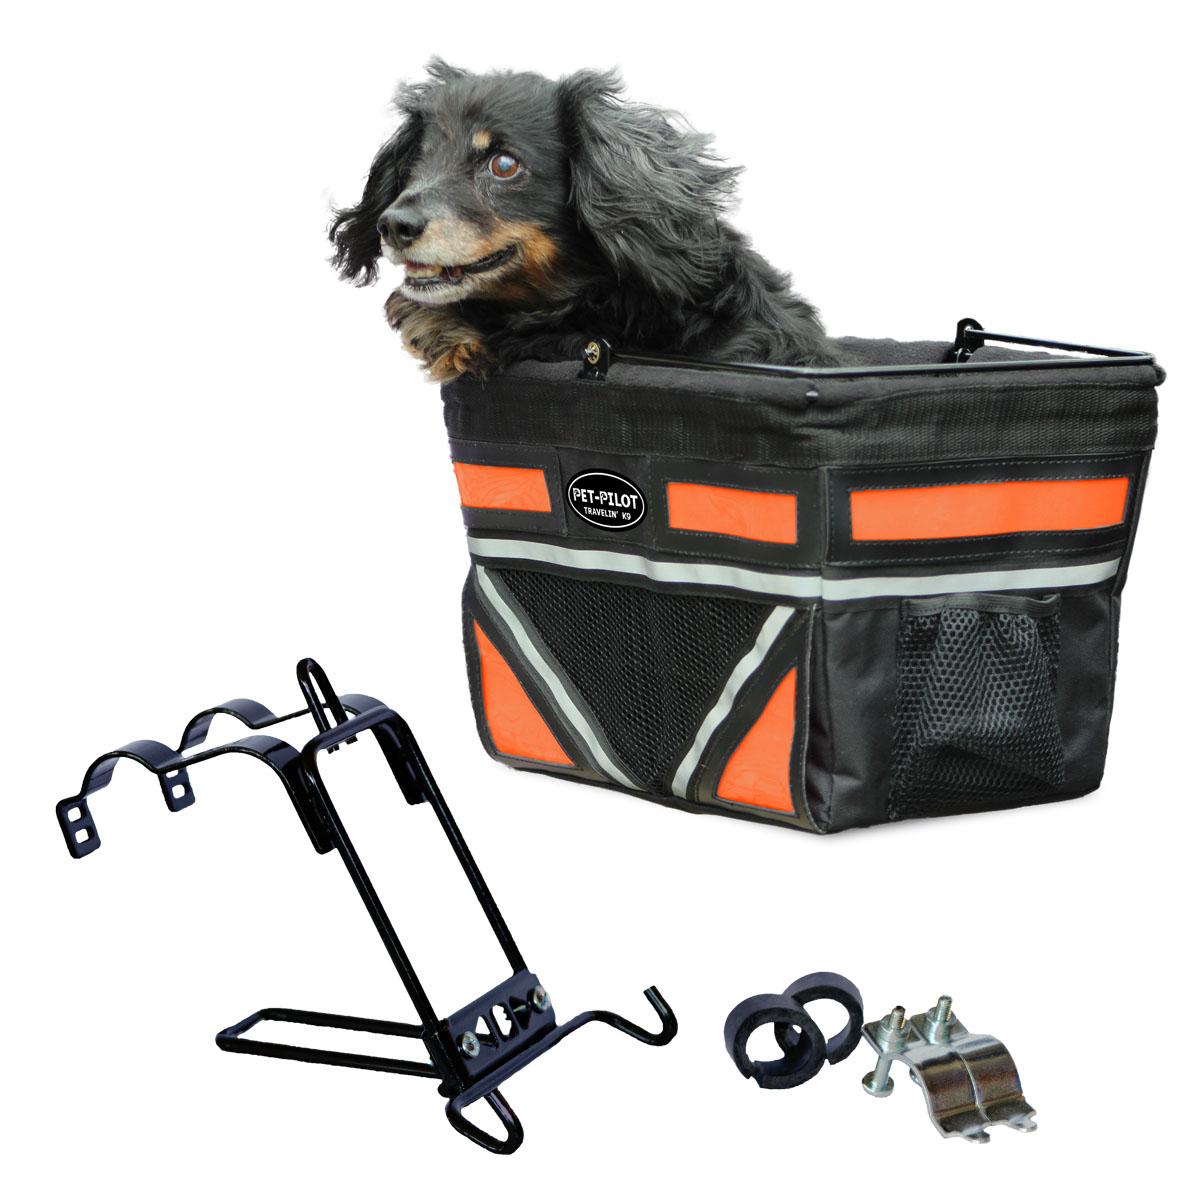 Travelin K9 2018 Pet-Pilot Bike Basket for Dogs & Cats, Neon Orange